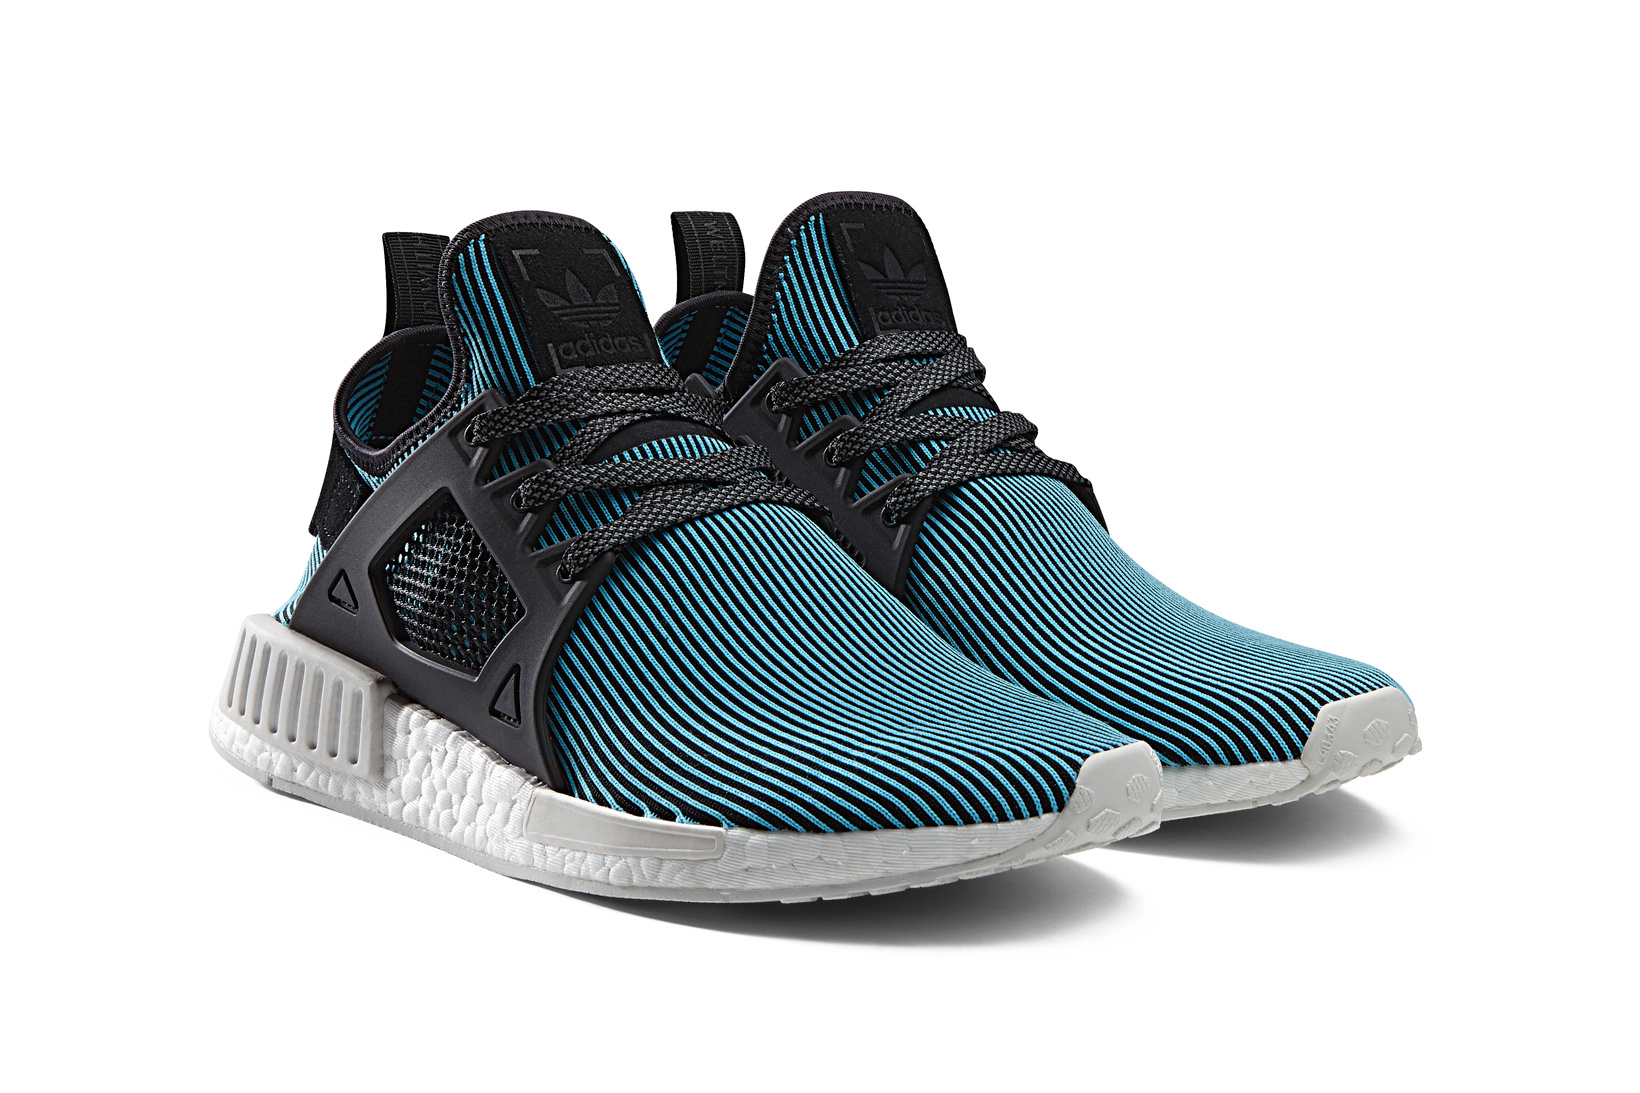 adidas nmd xr1 black and blue 2 sneakerbox.hu blog